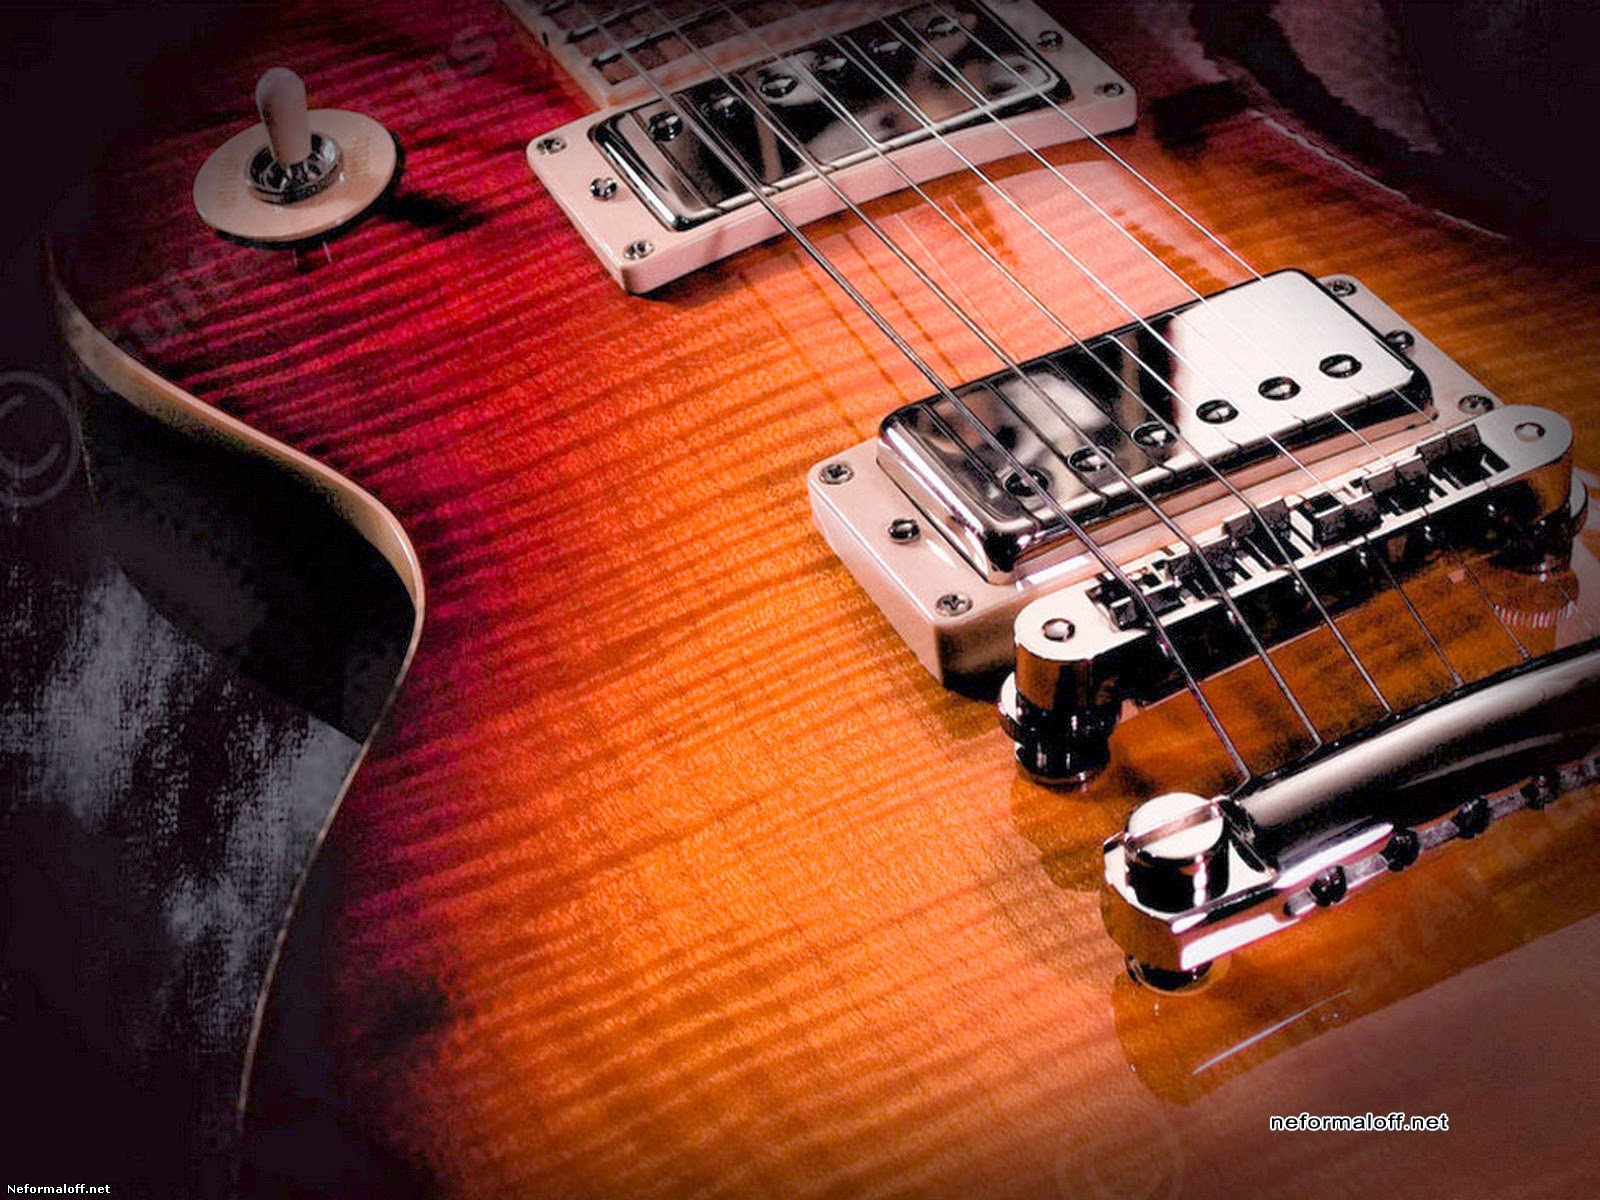 my guitar hd desktop wallpaper high definition mobile 1600x1200